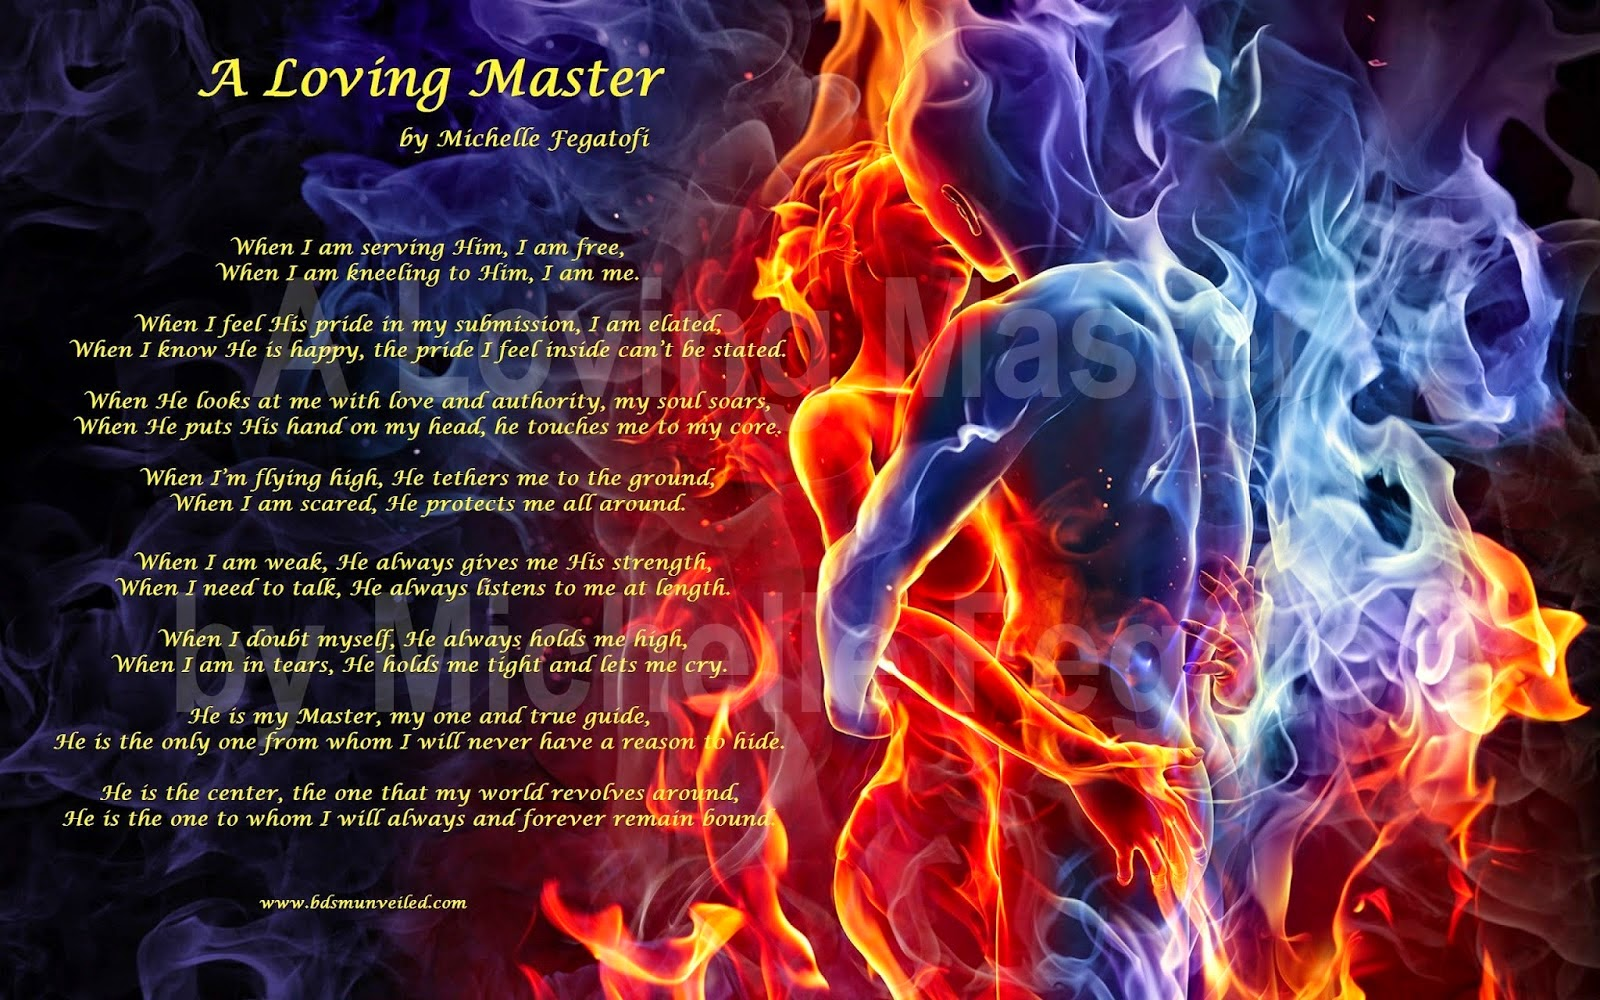 http://bdsmunveiled.com/2013/09/a-loving-master.html